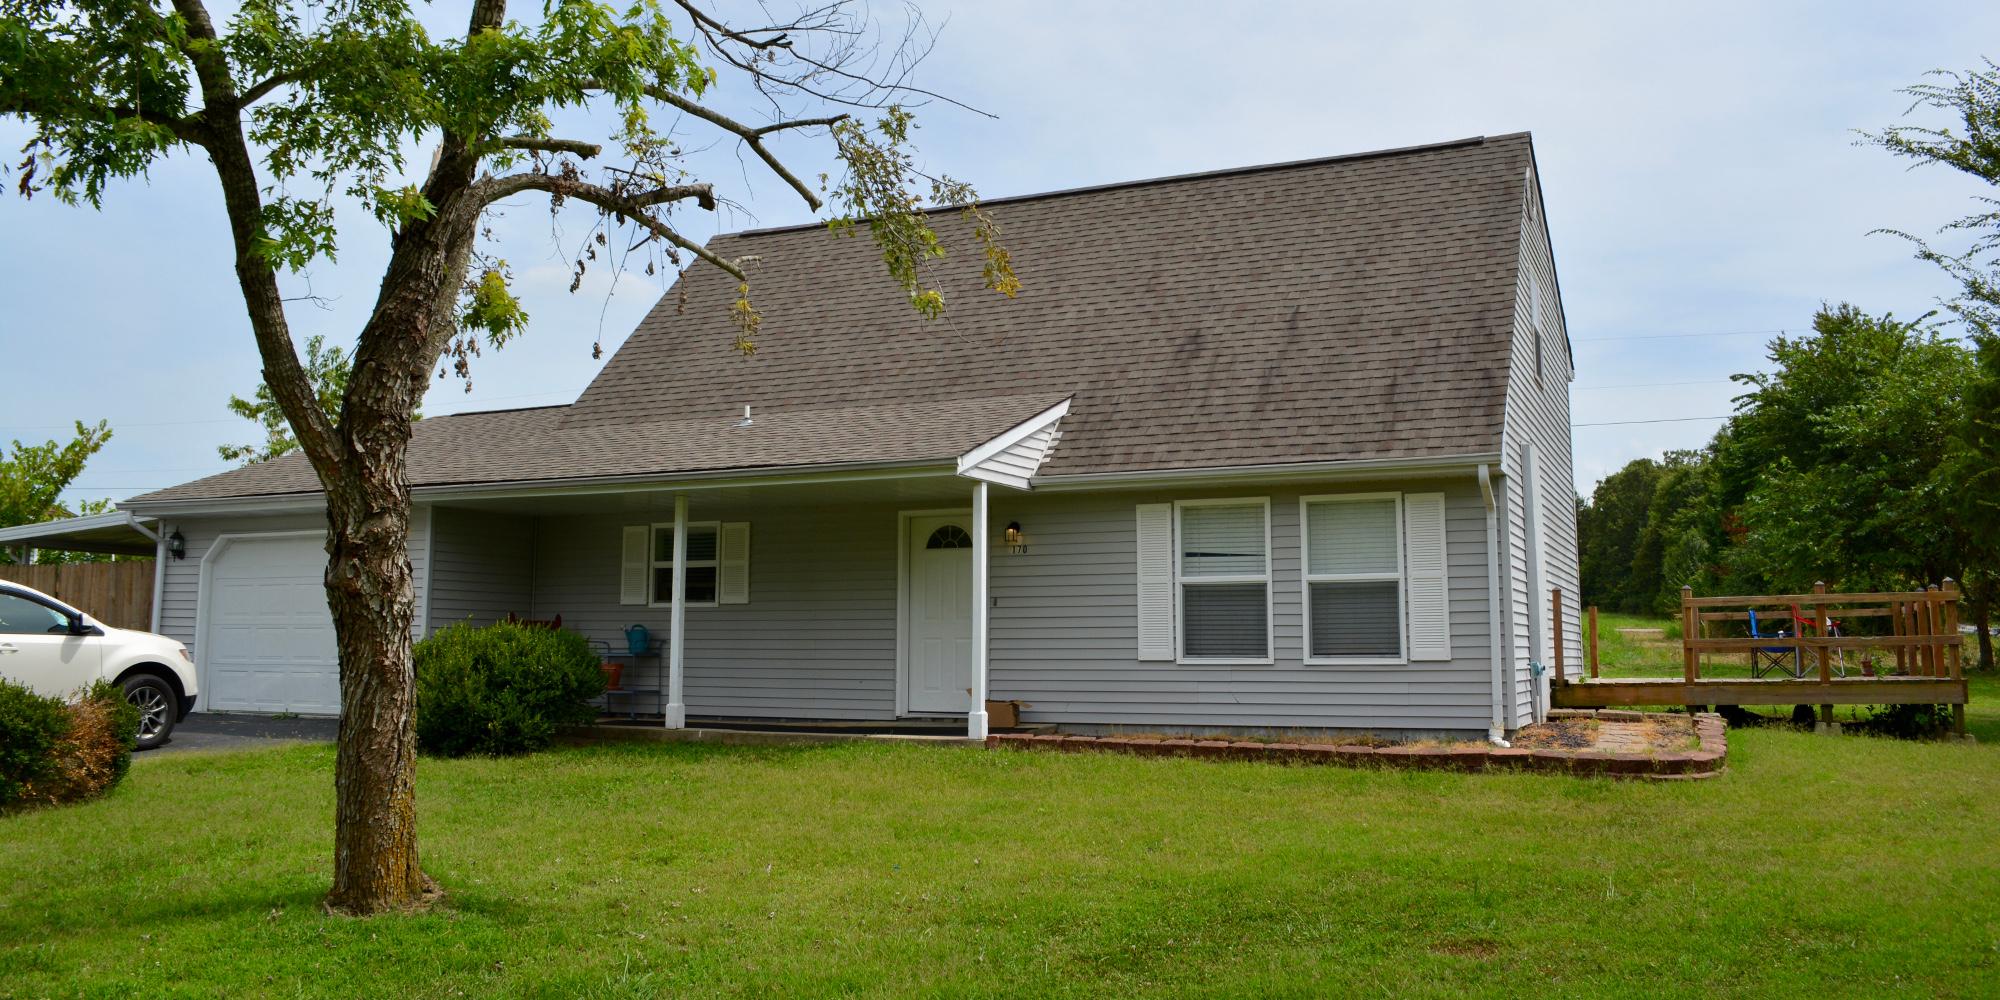 Nosari Home Mortgage We Make Home Loans Easy